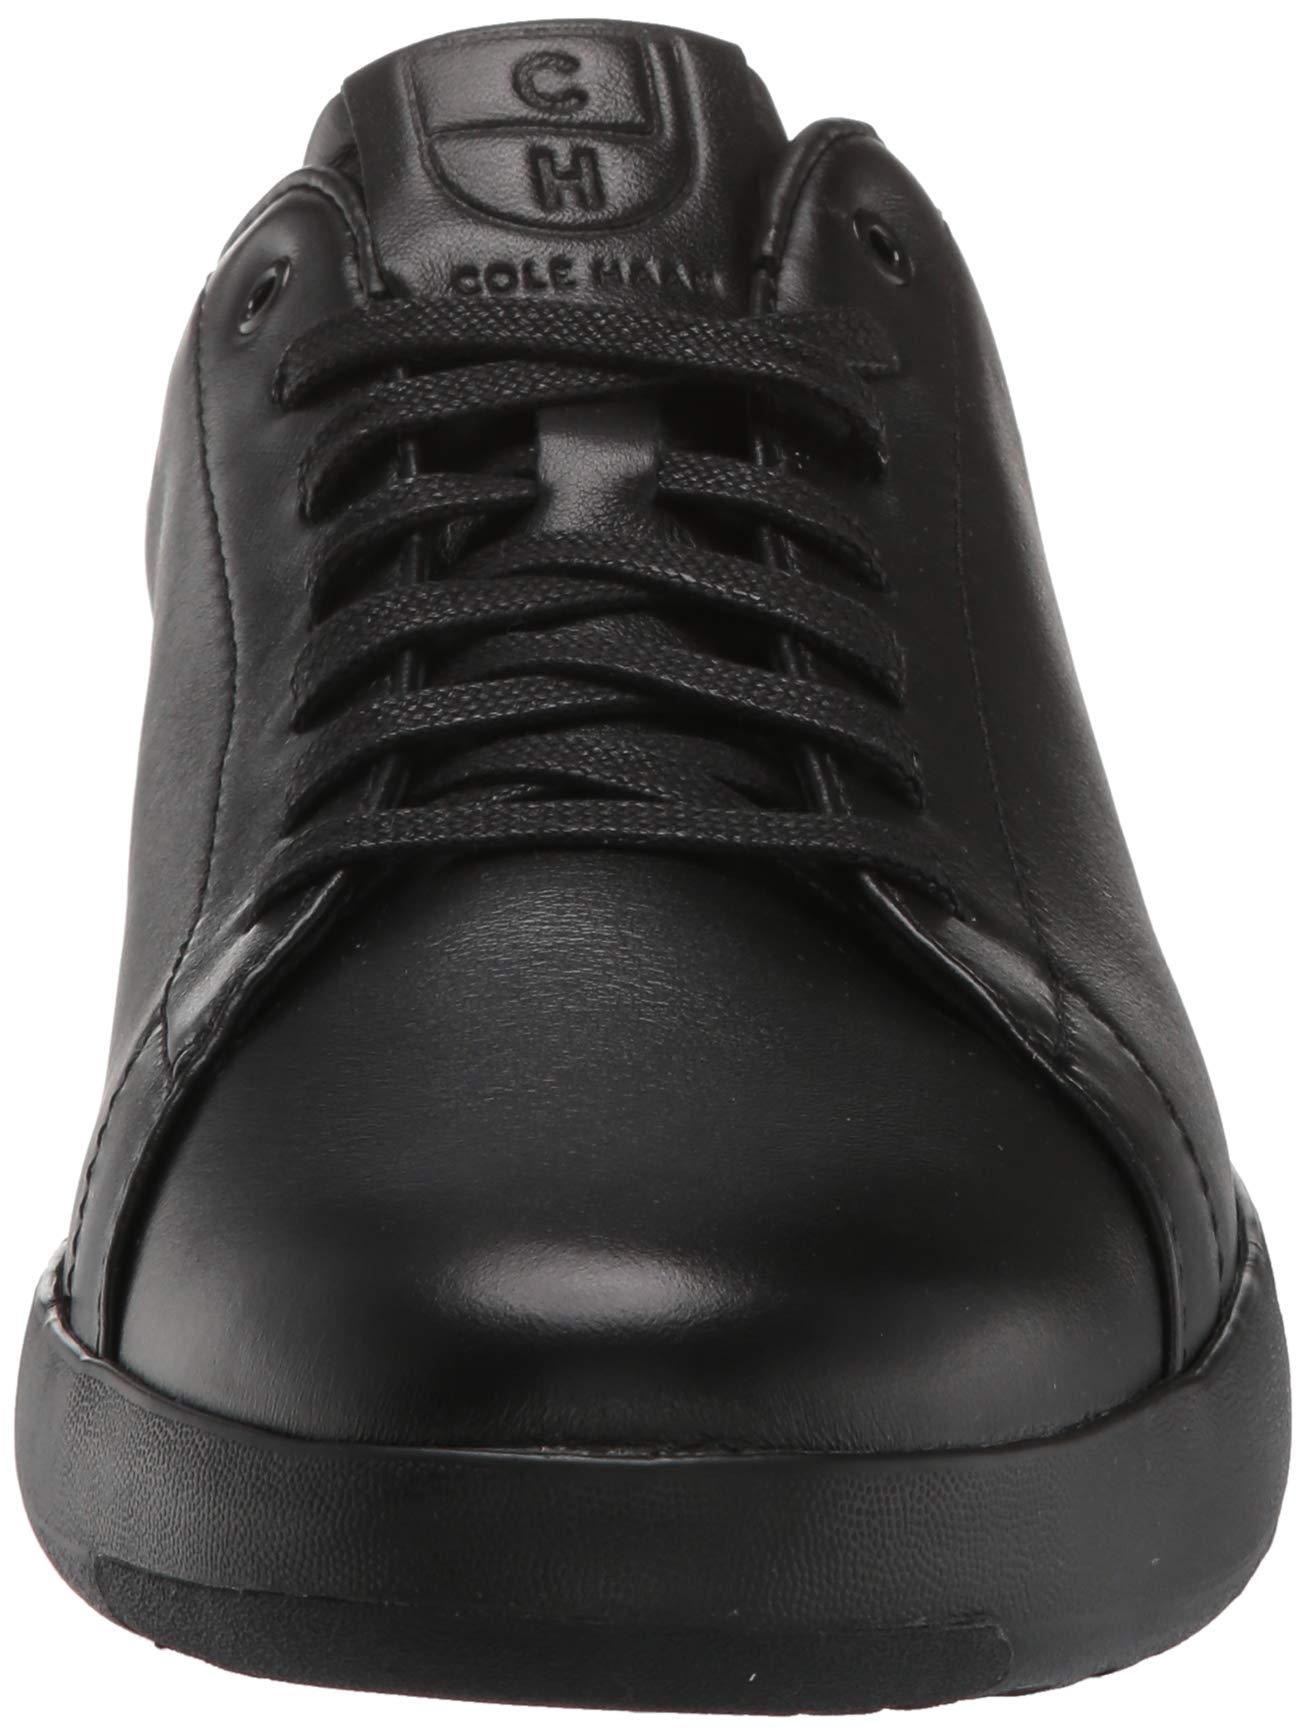 Cole Haan Men's Grandpro Tennis Fashion Sneaker, Black/British Tan, 7 M US by Cole Haan (Image #4)